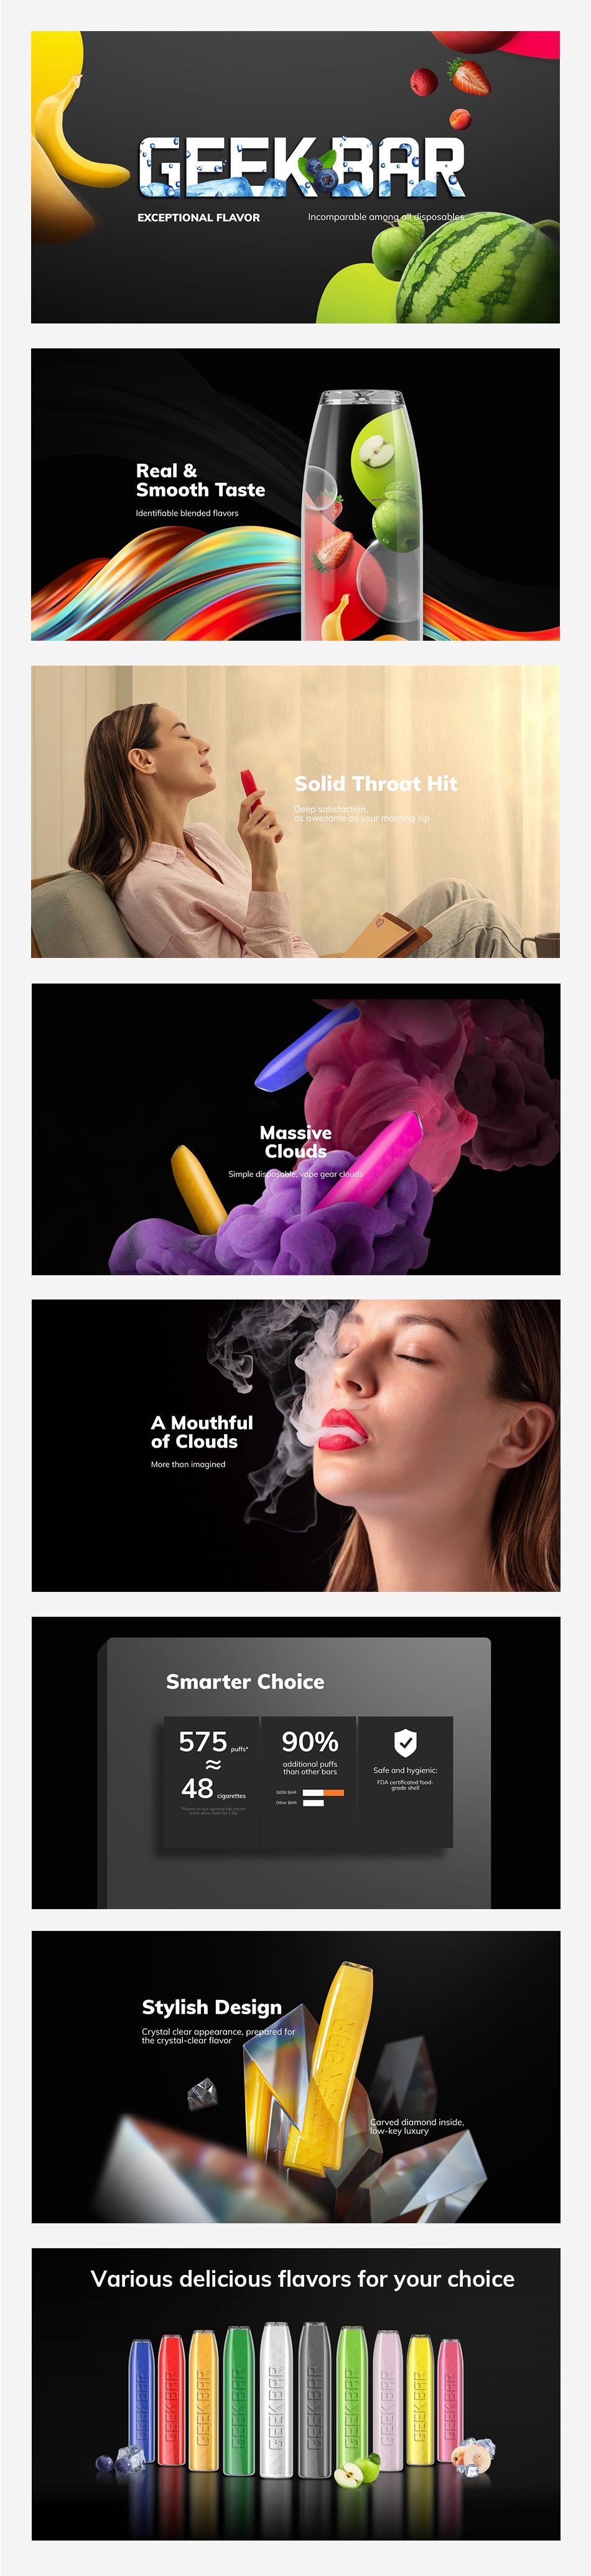 geekbar_disposable_electronic_cigarete_infographic